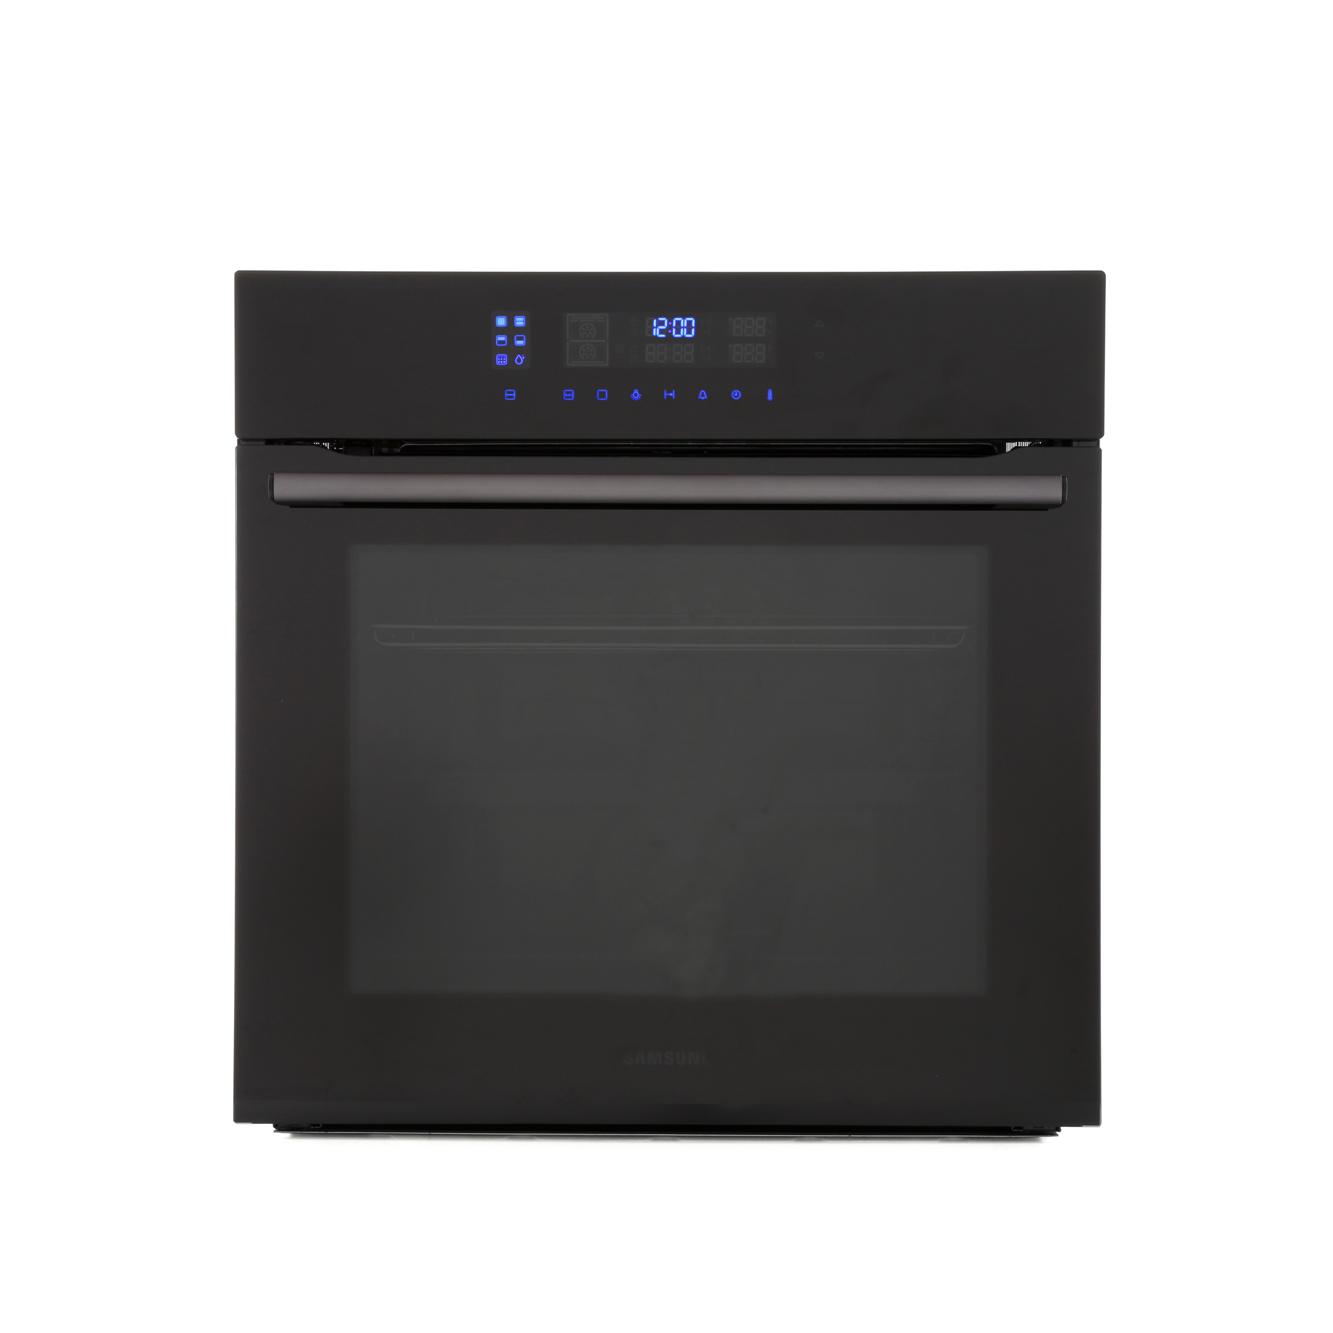 buy samsung prezio dual cook bq2q7g078 single built in electric oven pyrolytic bq2q7g078. Black Bedroom Furniture Sets. Home Design Ideas